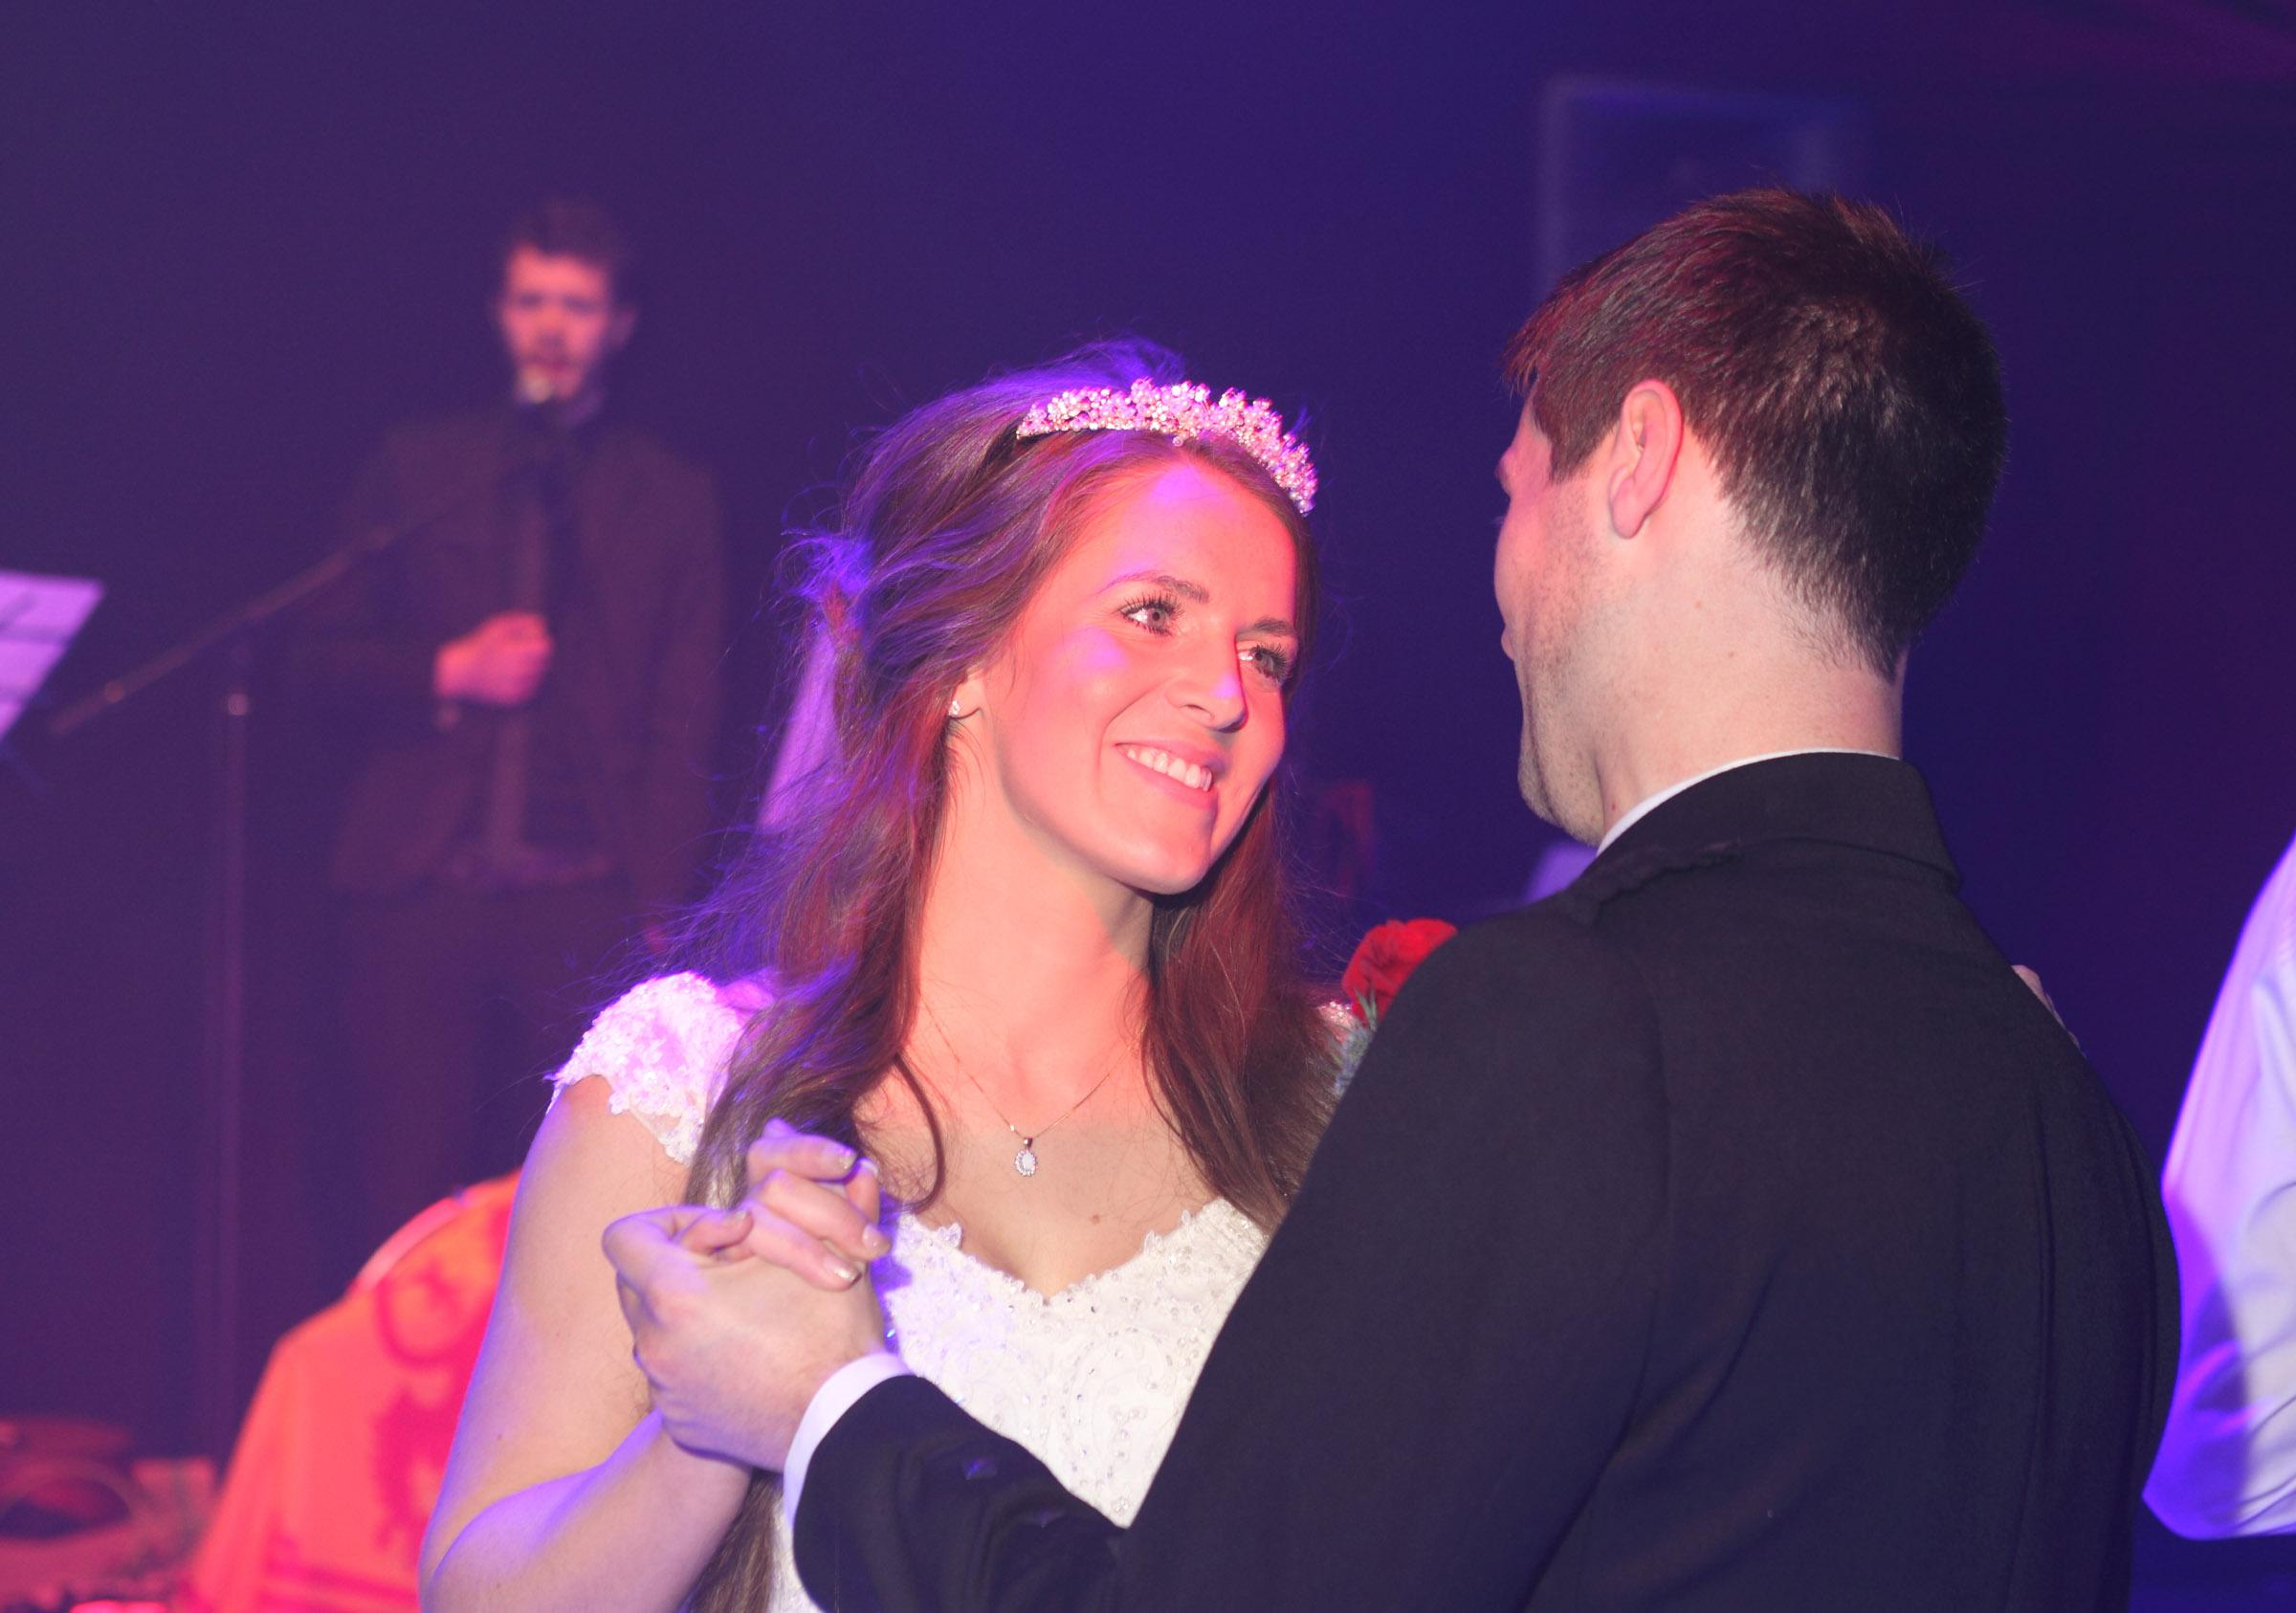 Wedding_Photography_in_Edinburgh_FirstDance_shot.jpg